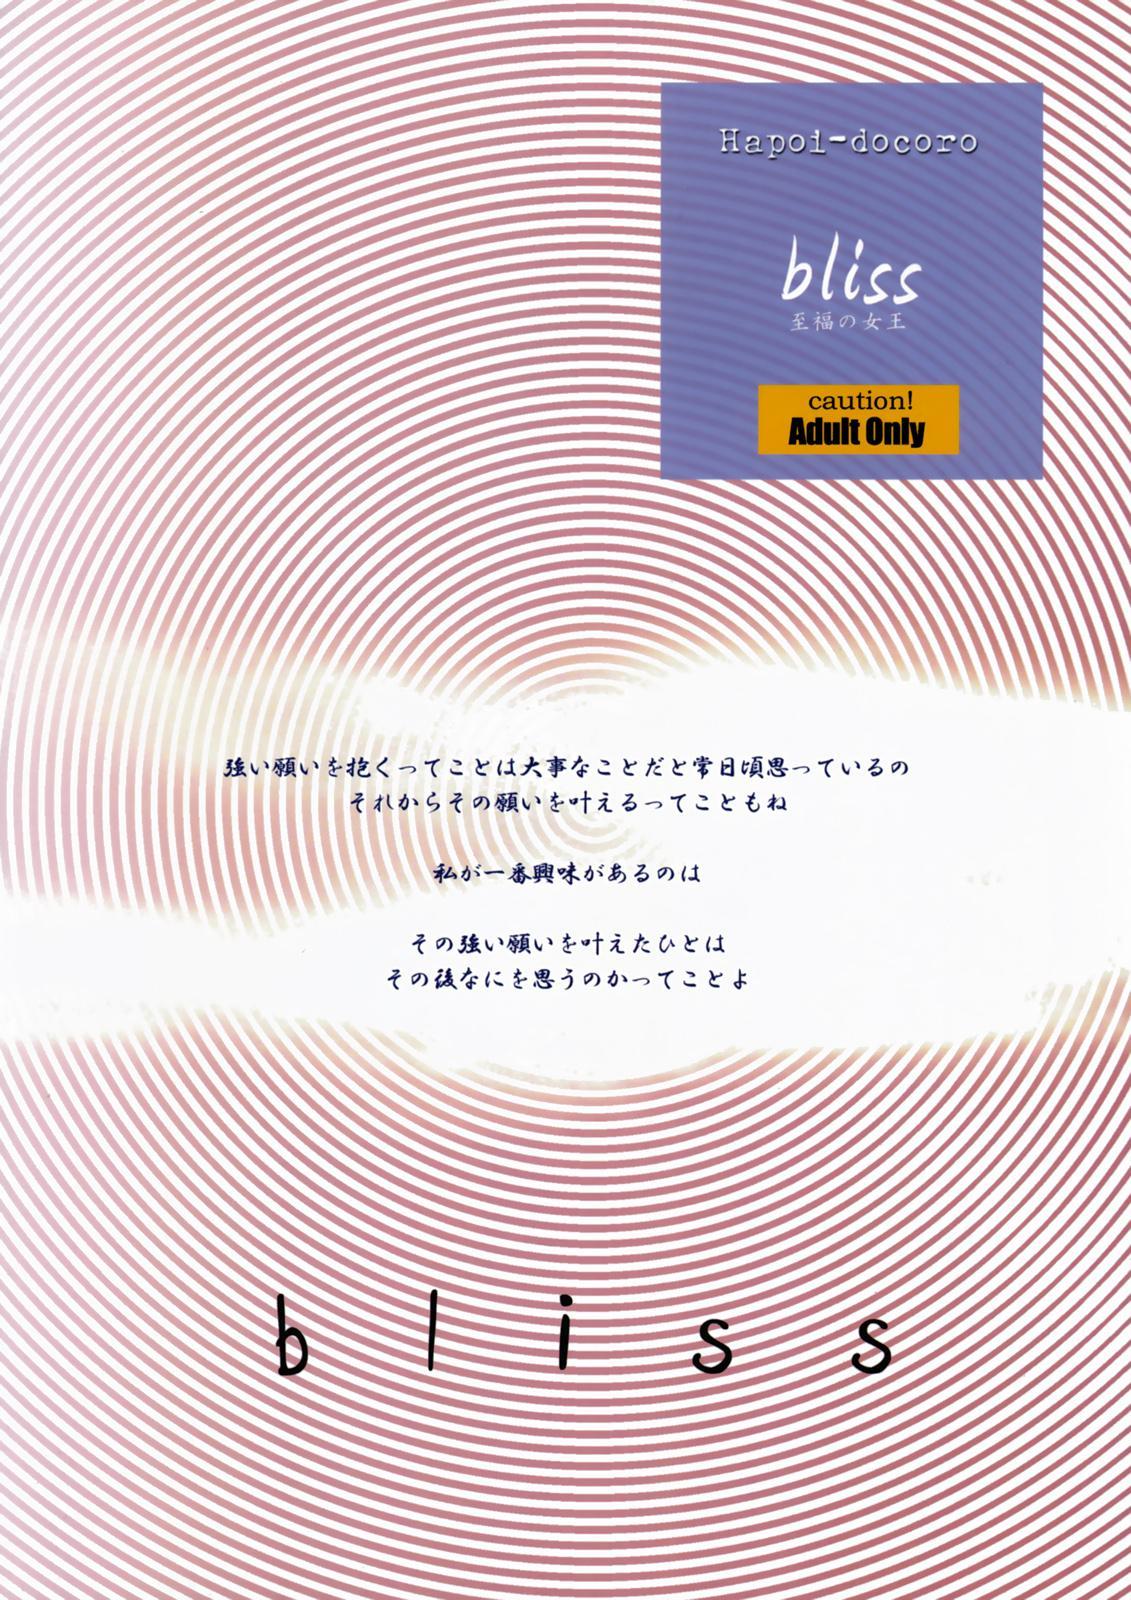 bliss 25